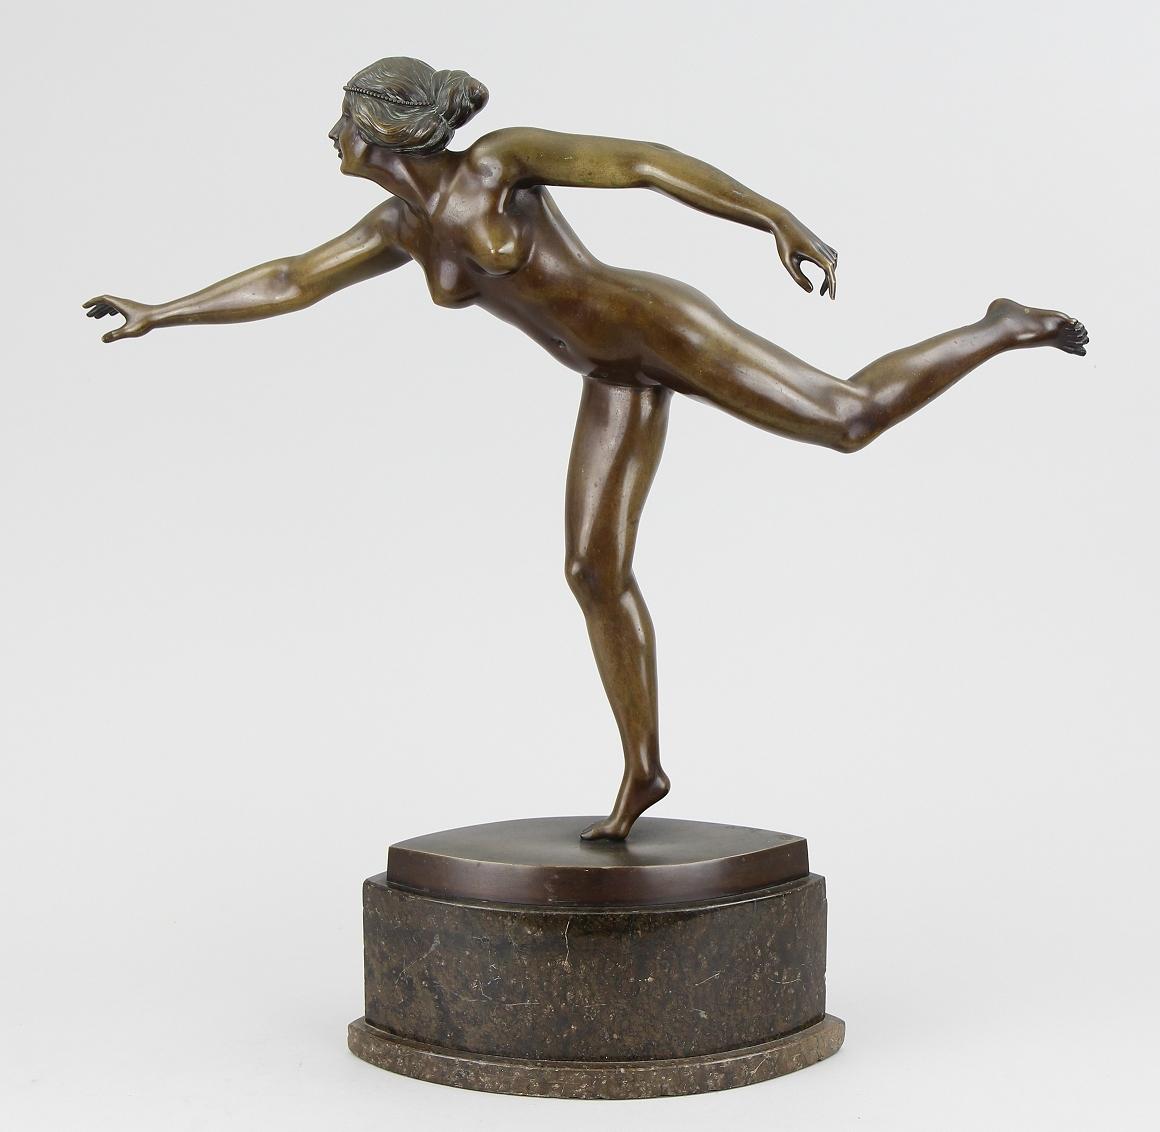 Bronzefigur G.Jaeger, Erlös